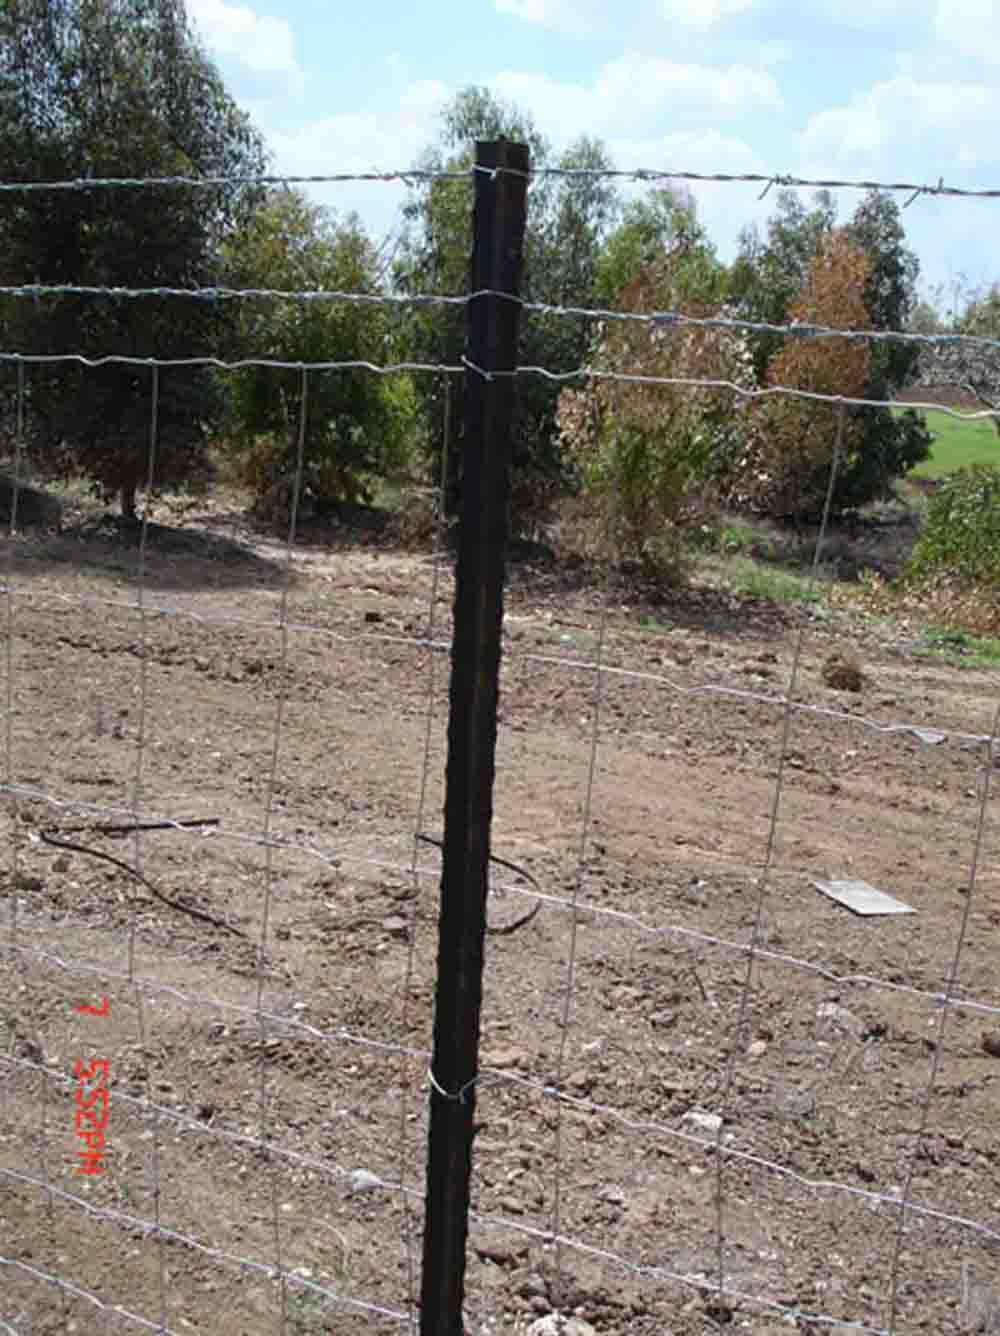 Y Fence Post (Israel Standard)